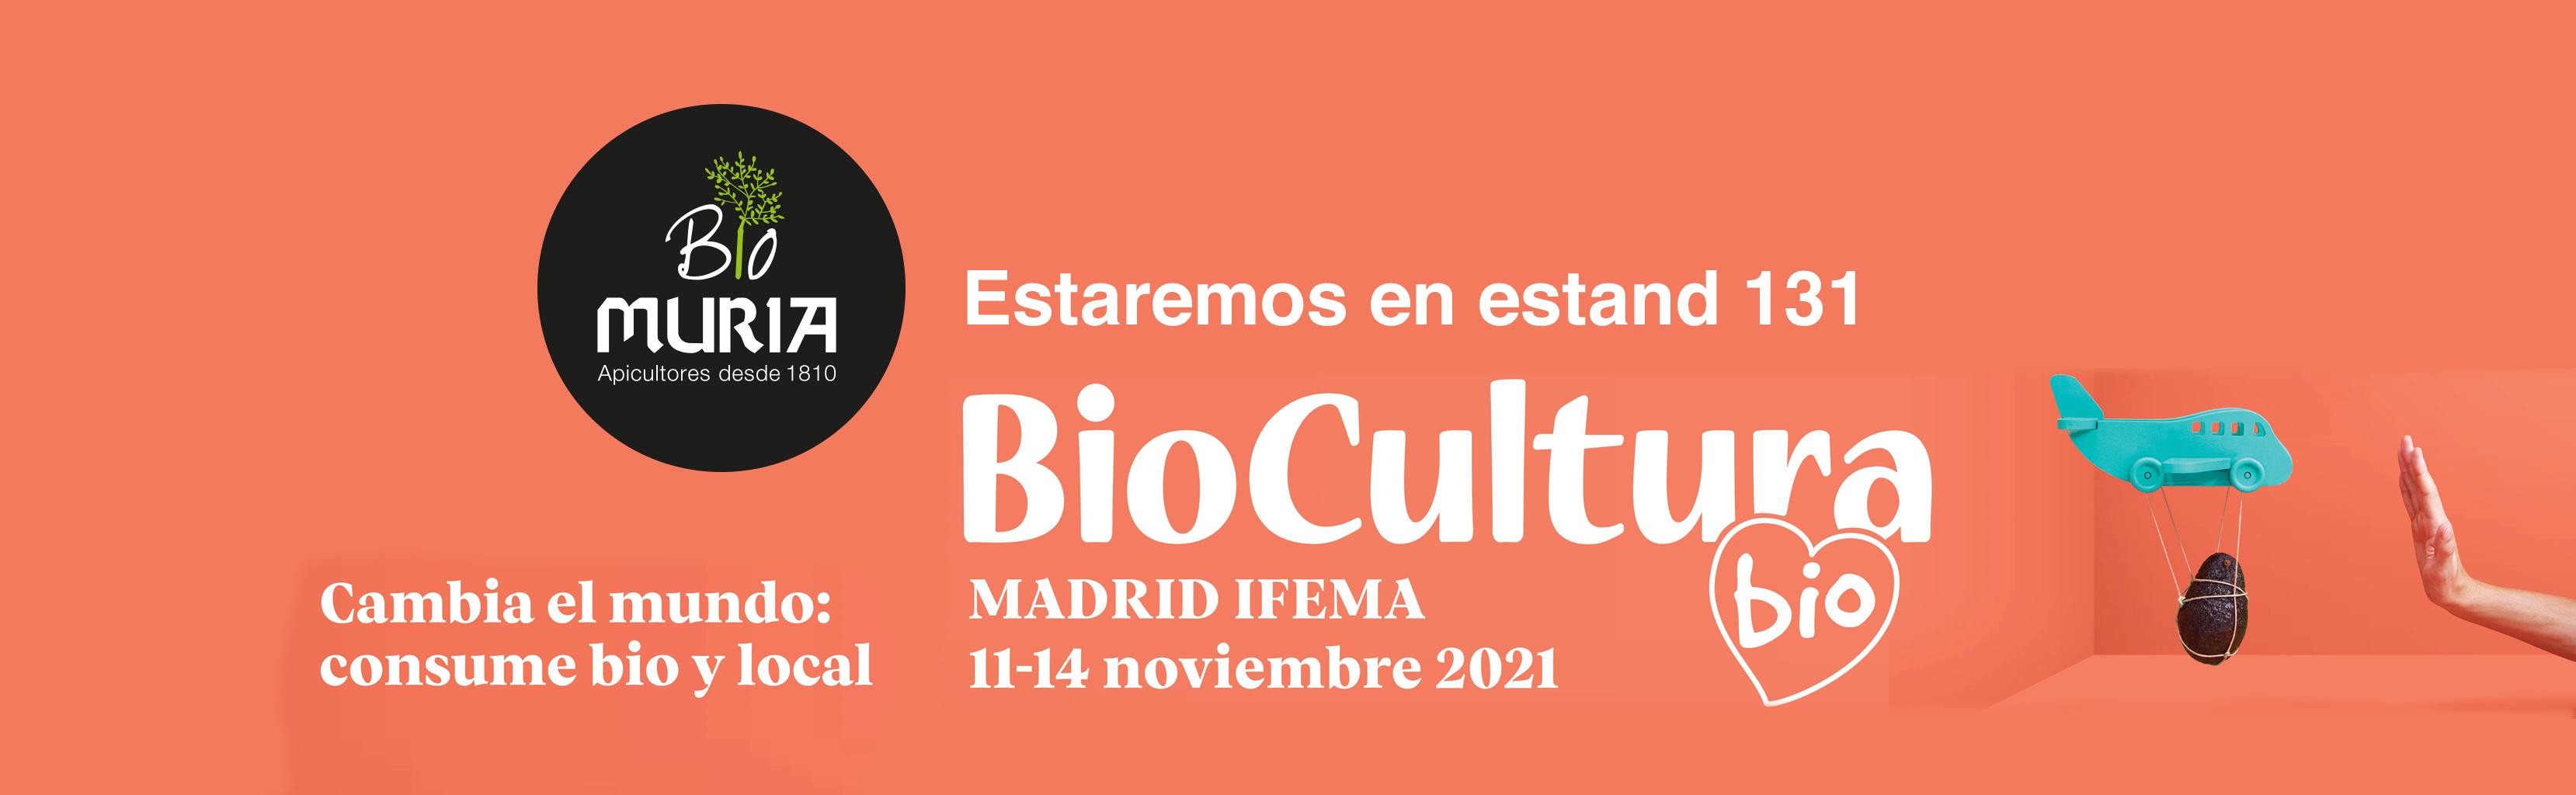 ok-BANNER-biocultura-madrid-novembre-2021-2